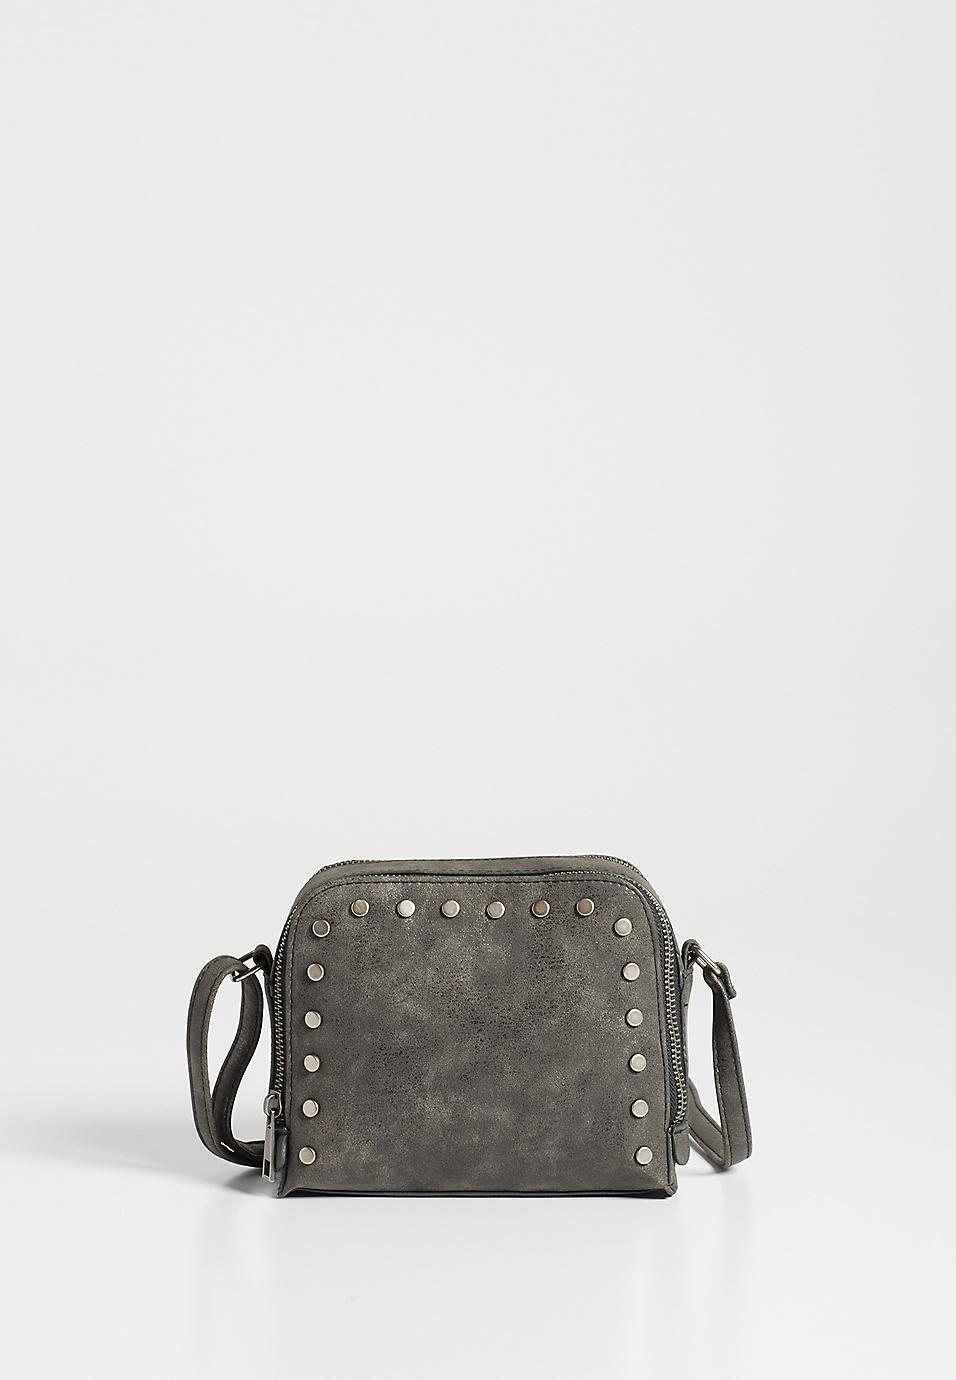 eee4317e8ff8 faux leather stud crossbody bag